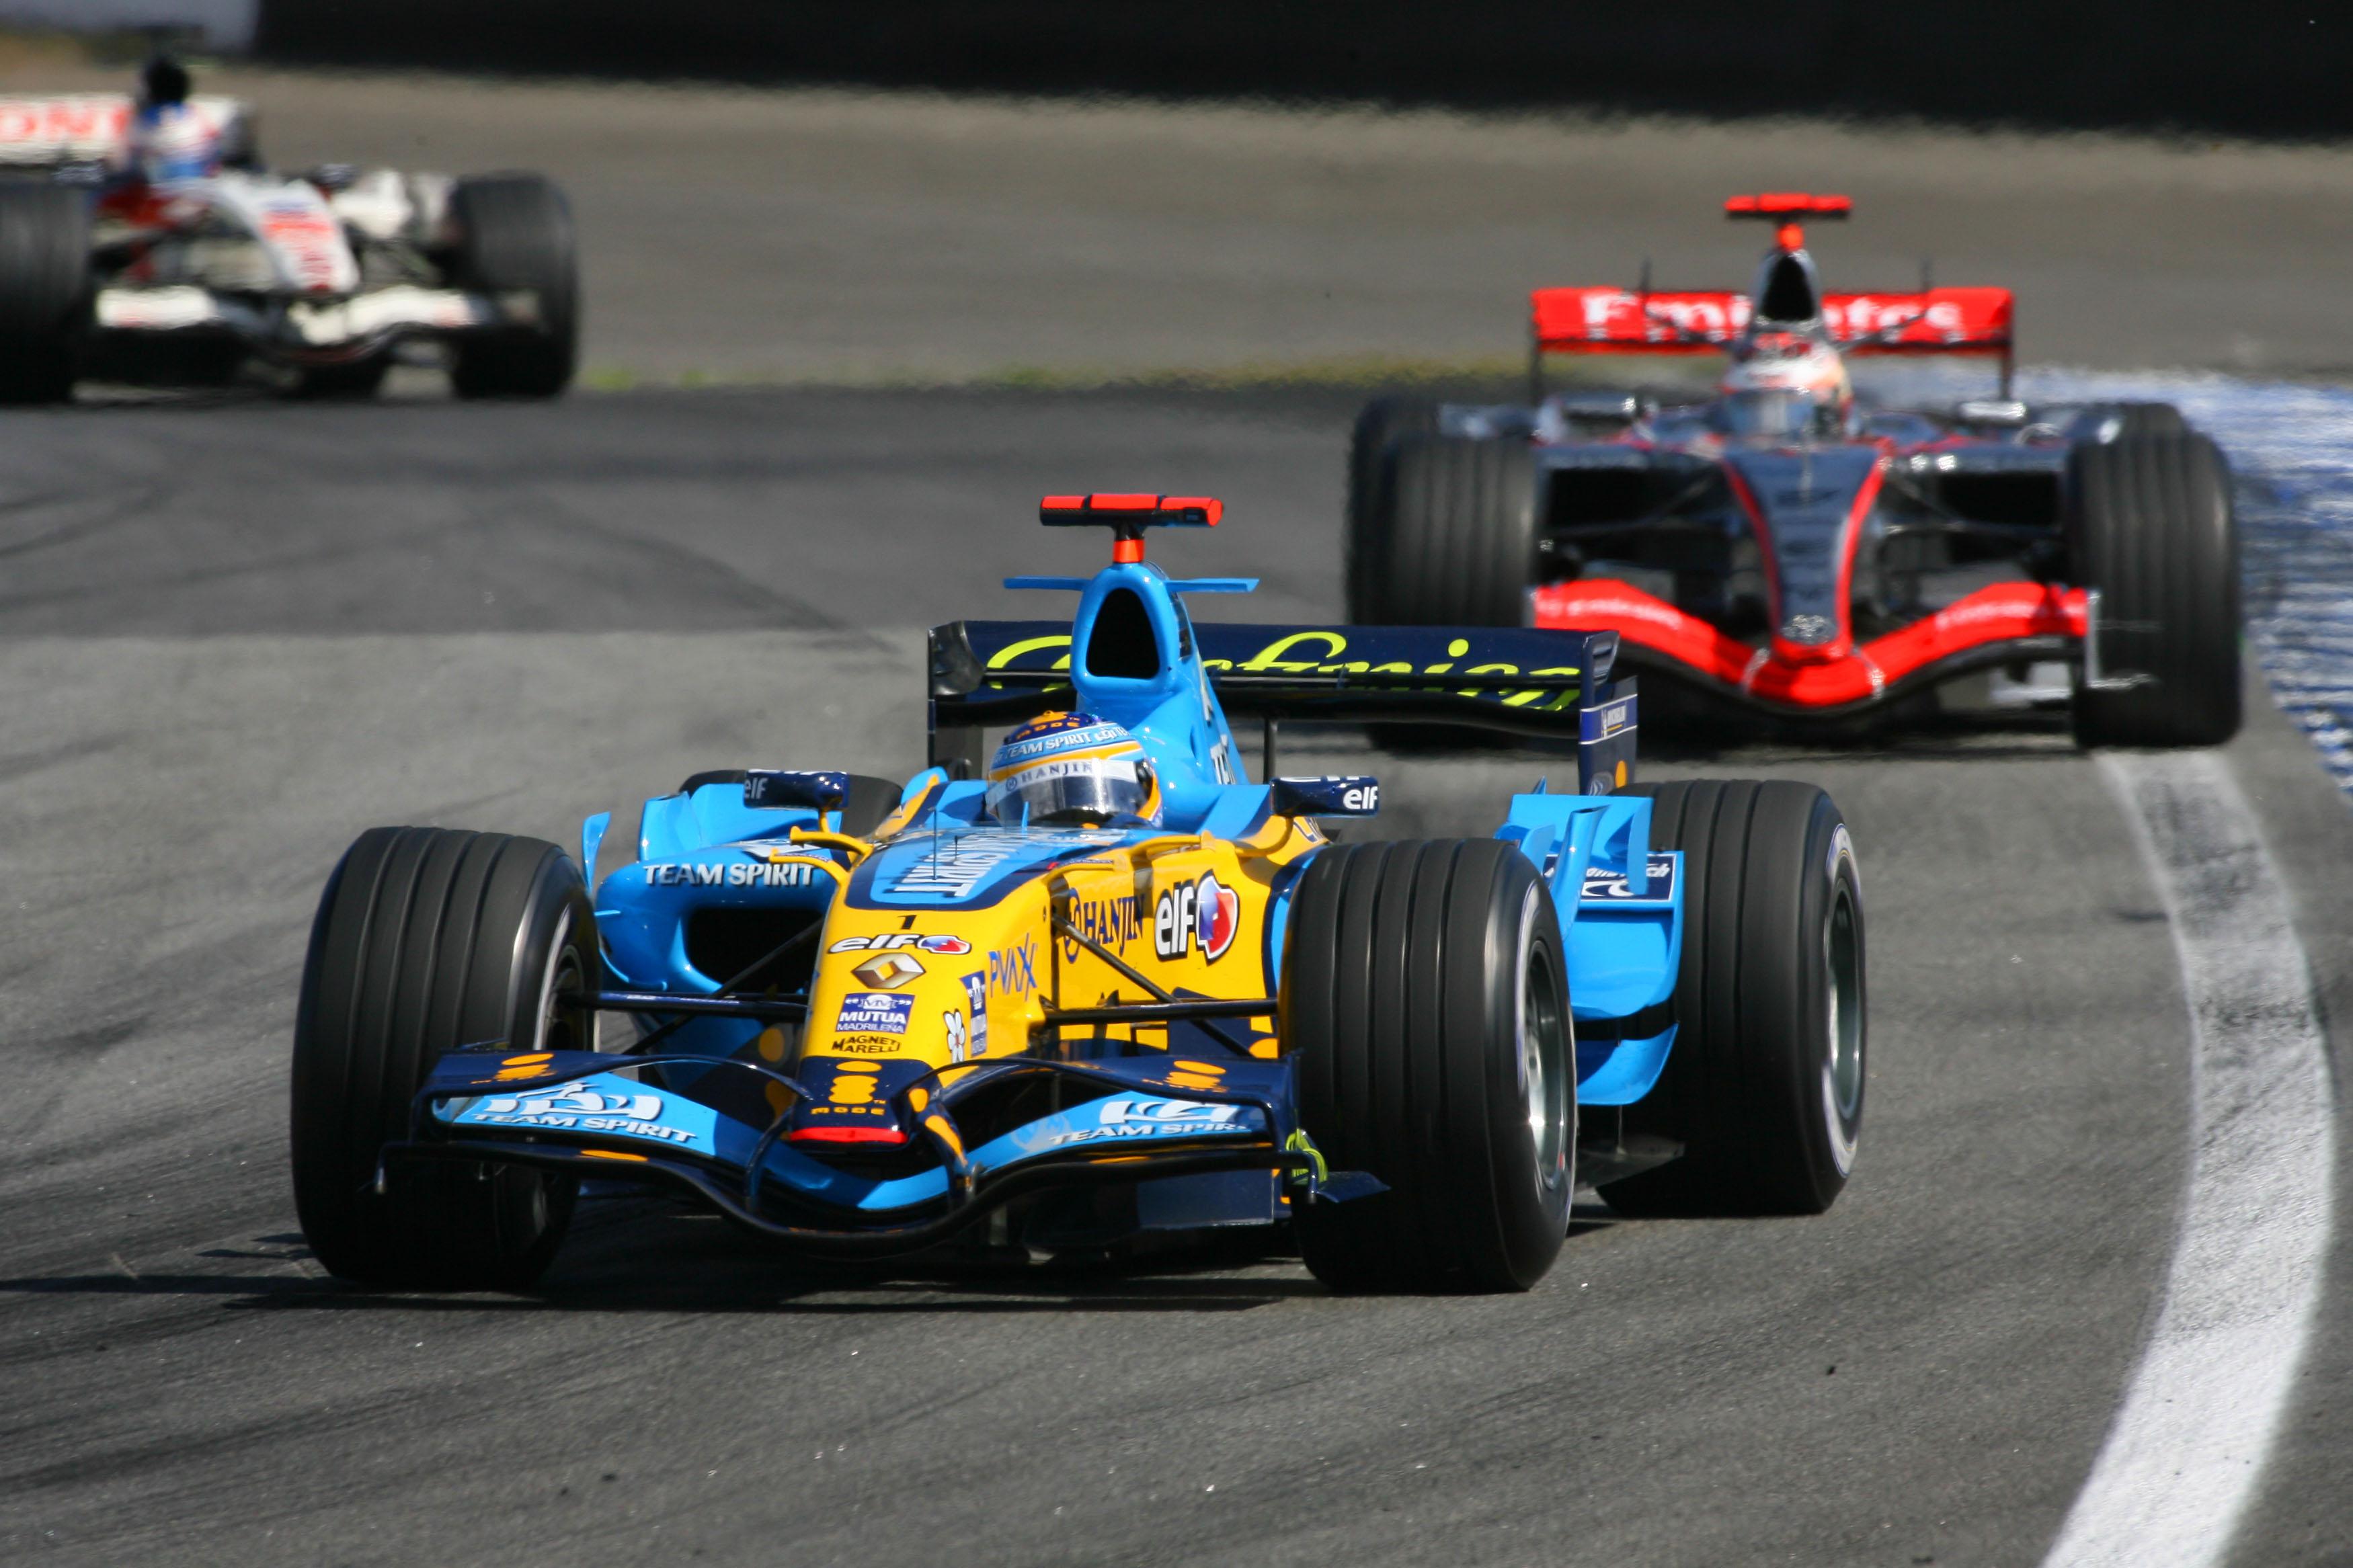 Fernando Alonso Renault Brazilian Grand Prix 2006